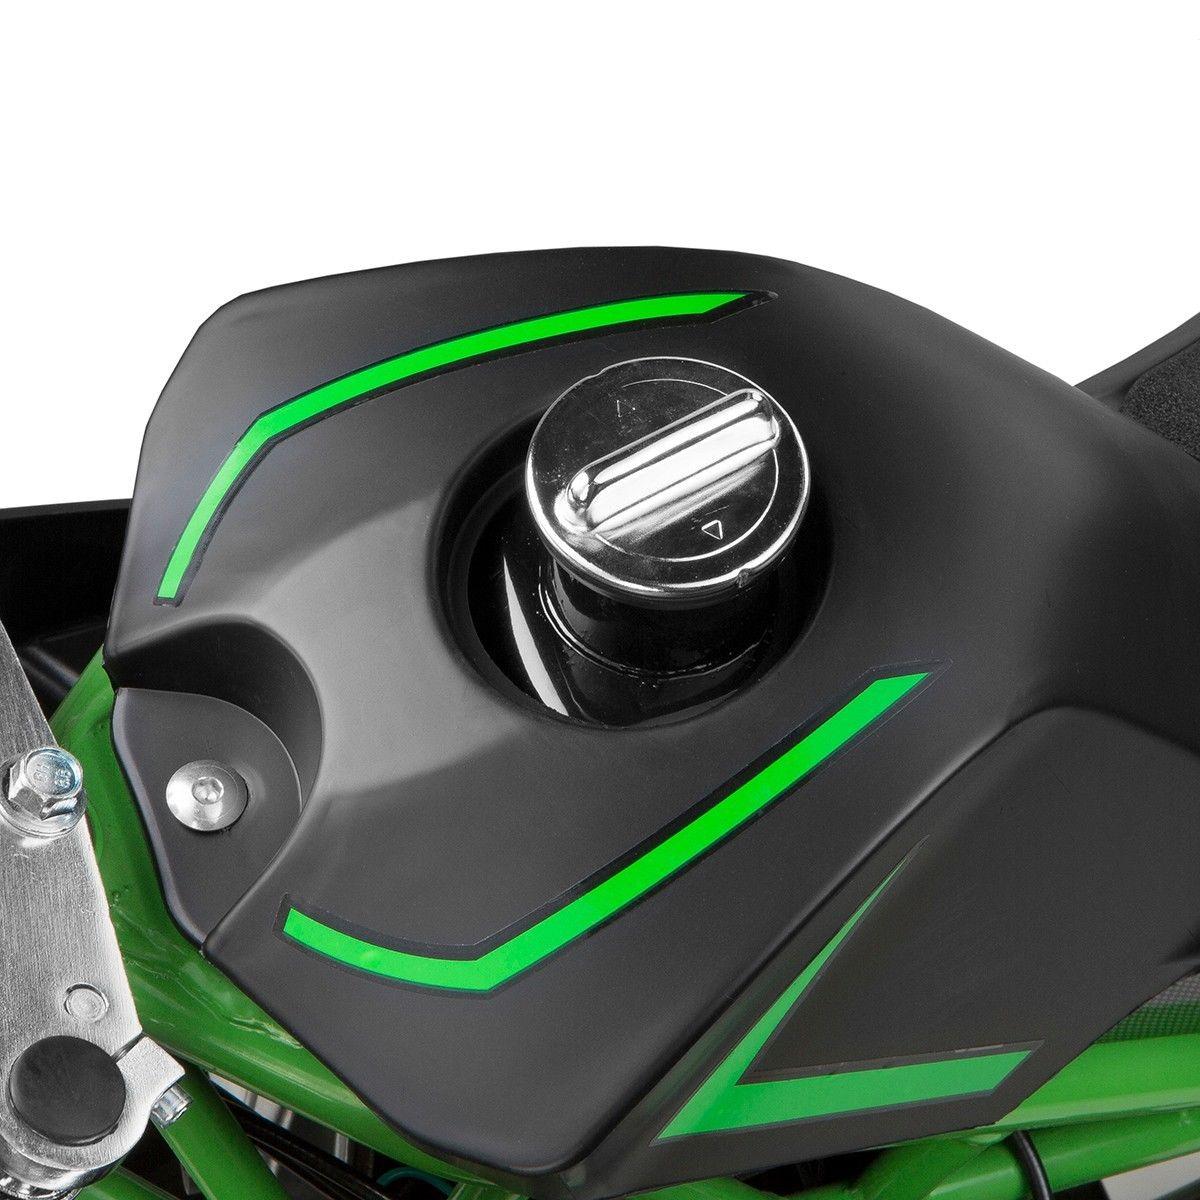 XtremepowerUS-Gas-Pocket-Bike-Motor-Bike-Scooter-40cc-Epa-Engine-Motorcycle thumbnail 17